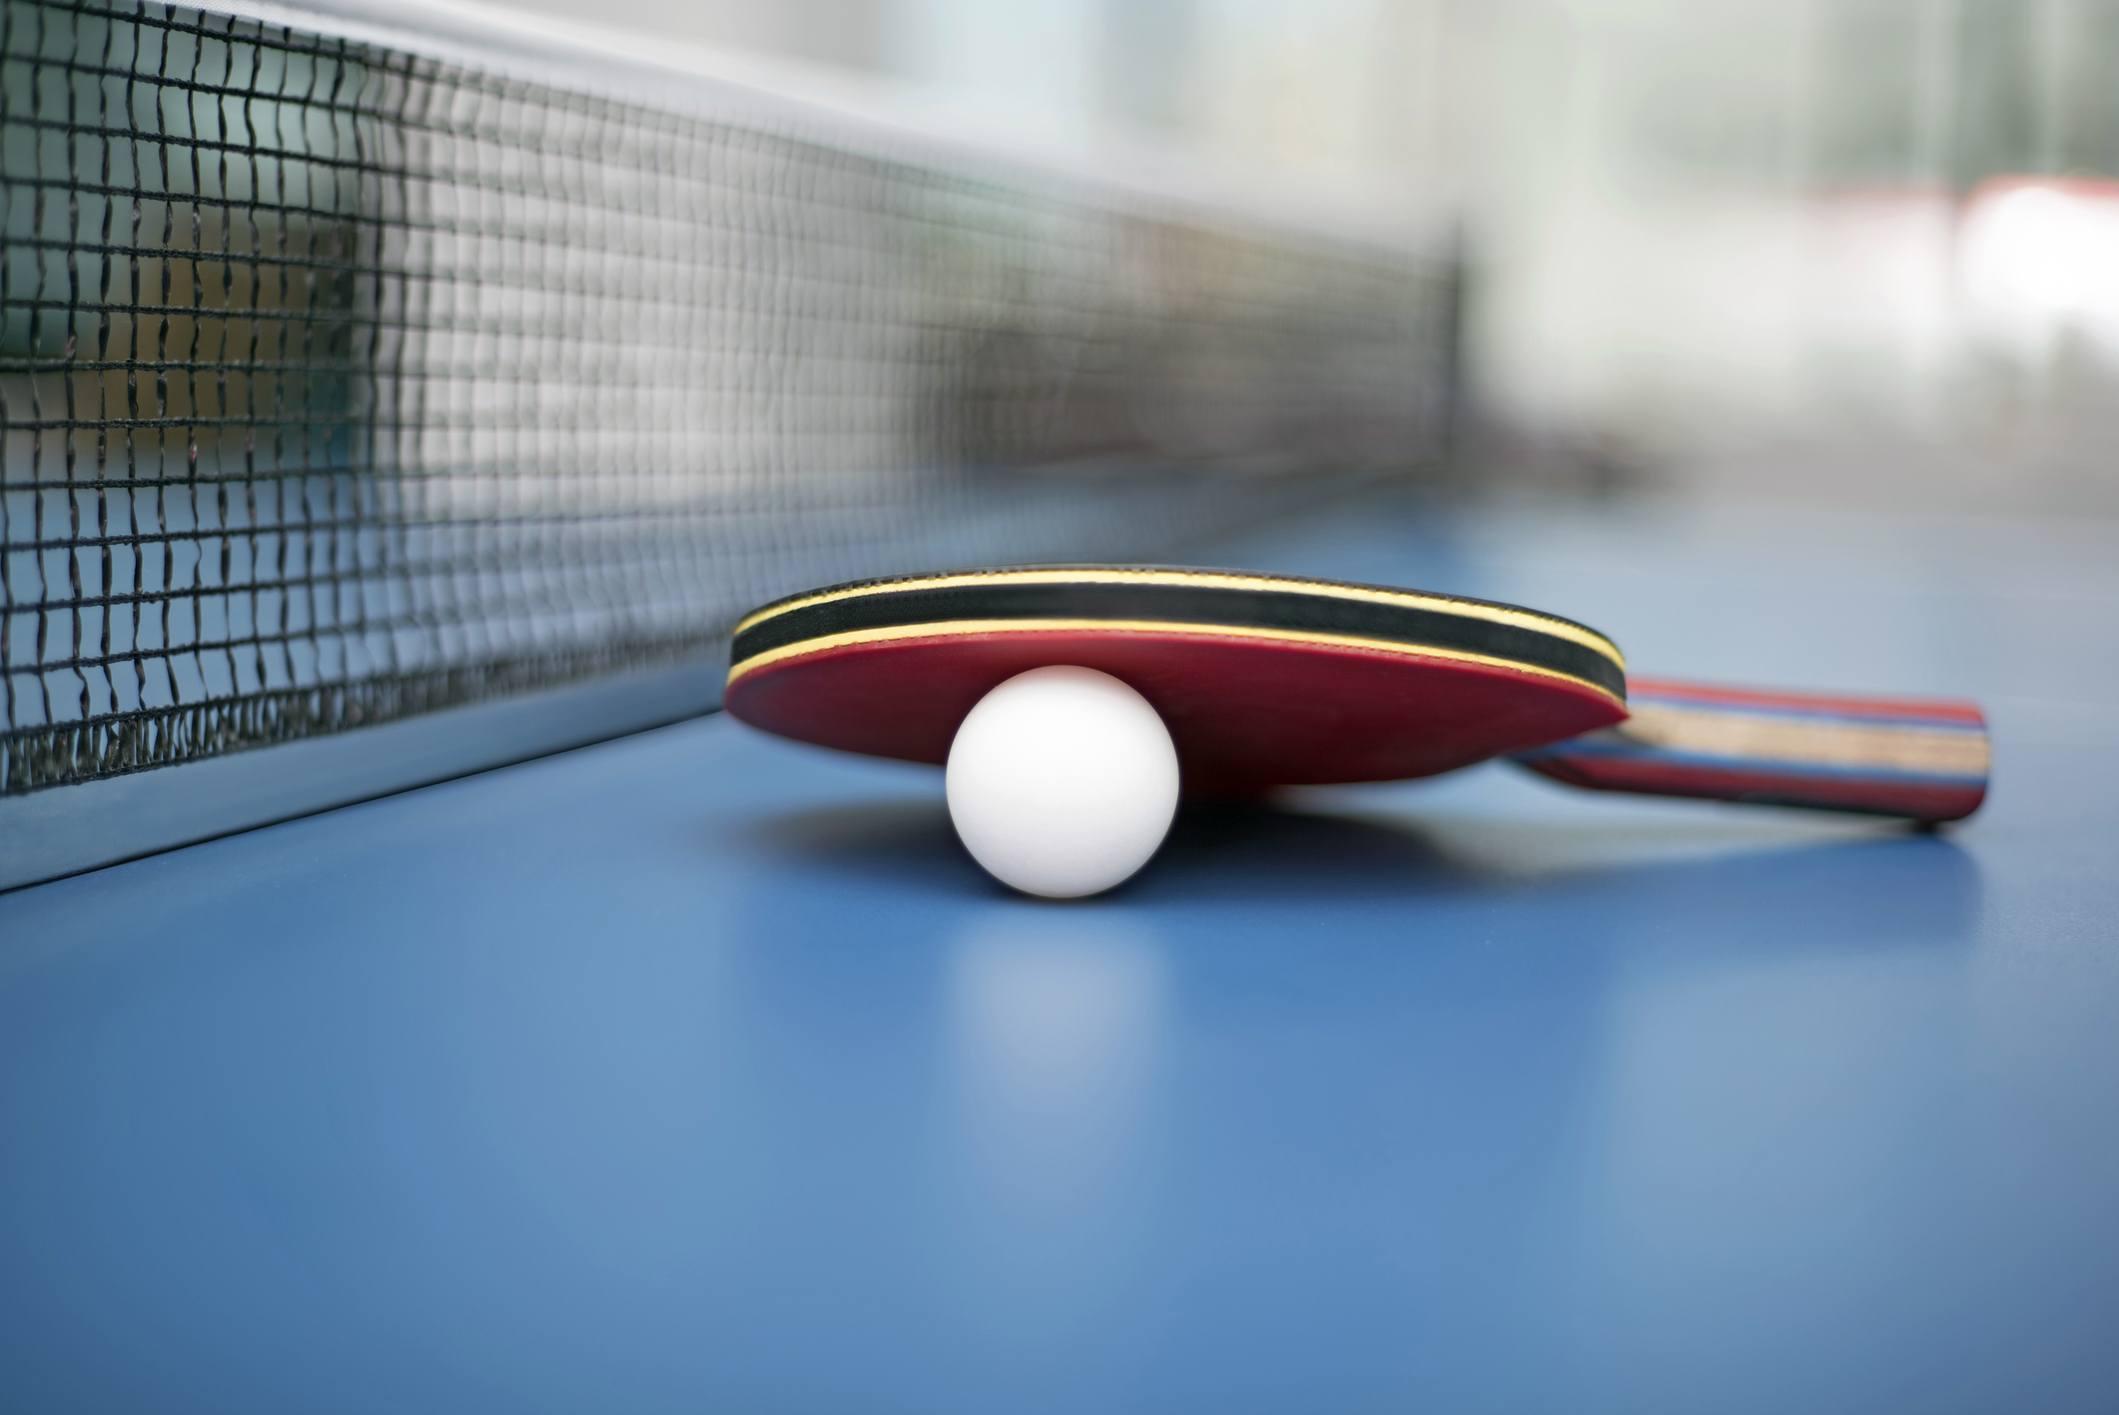 Table Tennis Ball and Bat